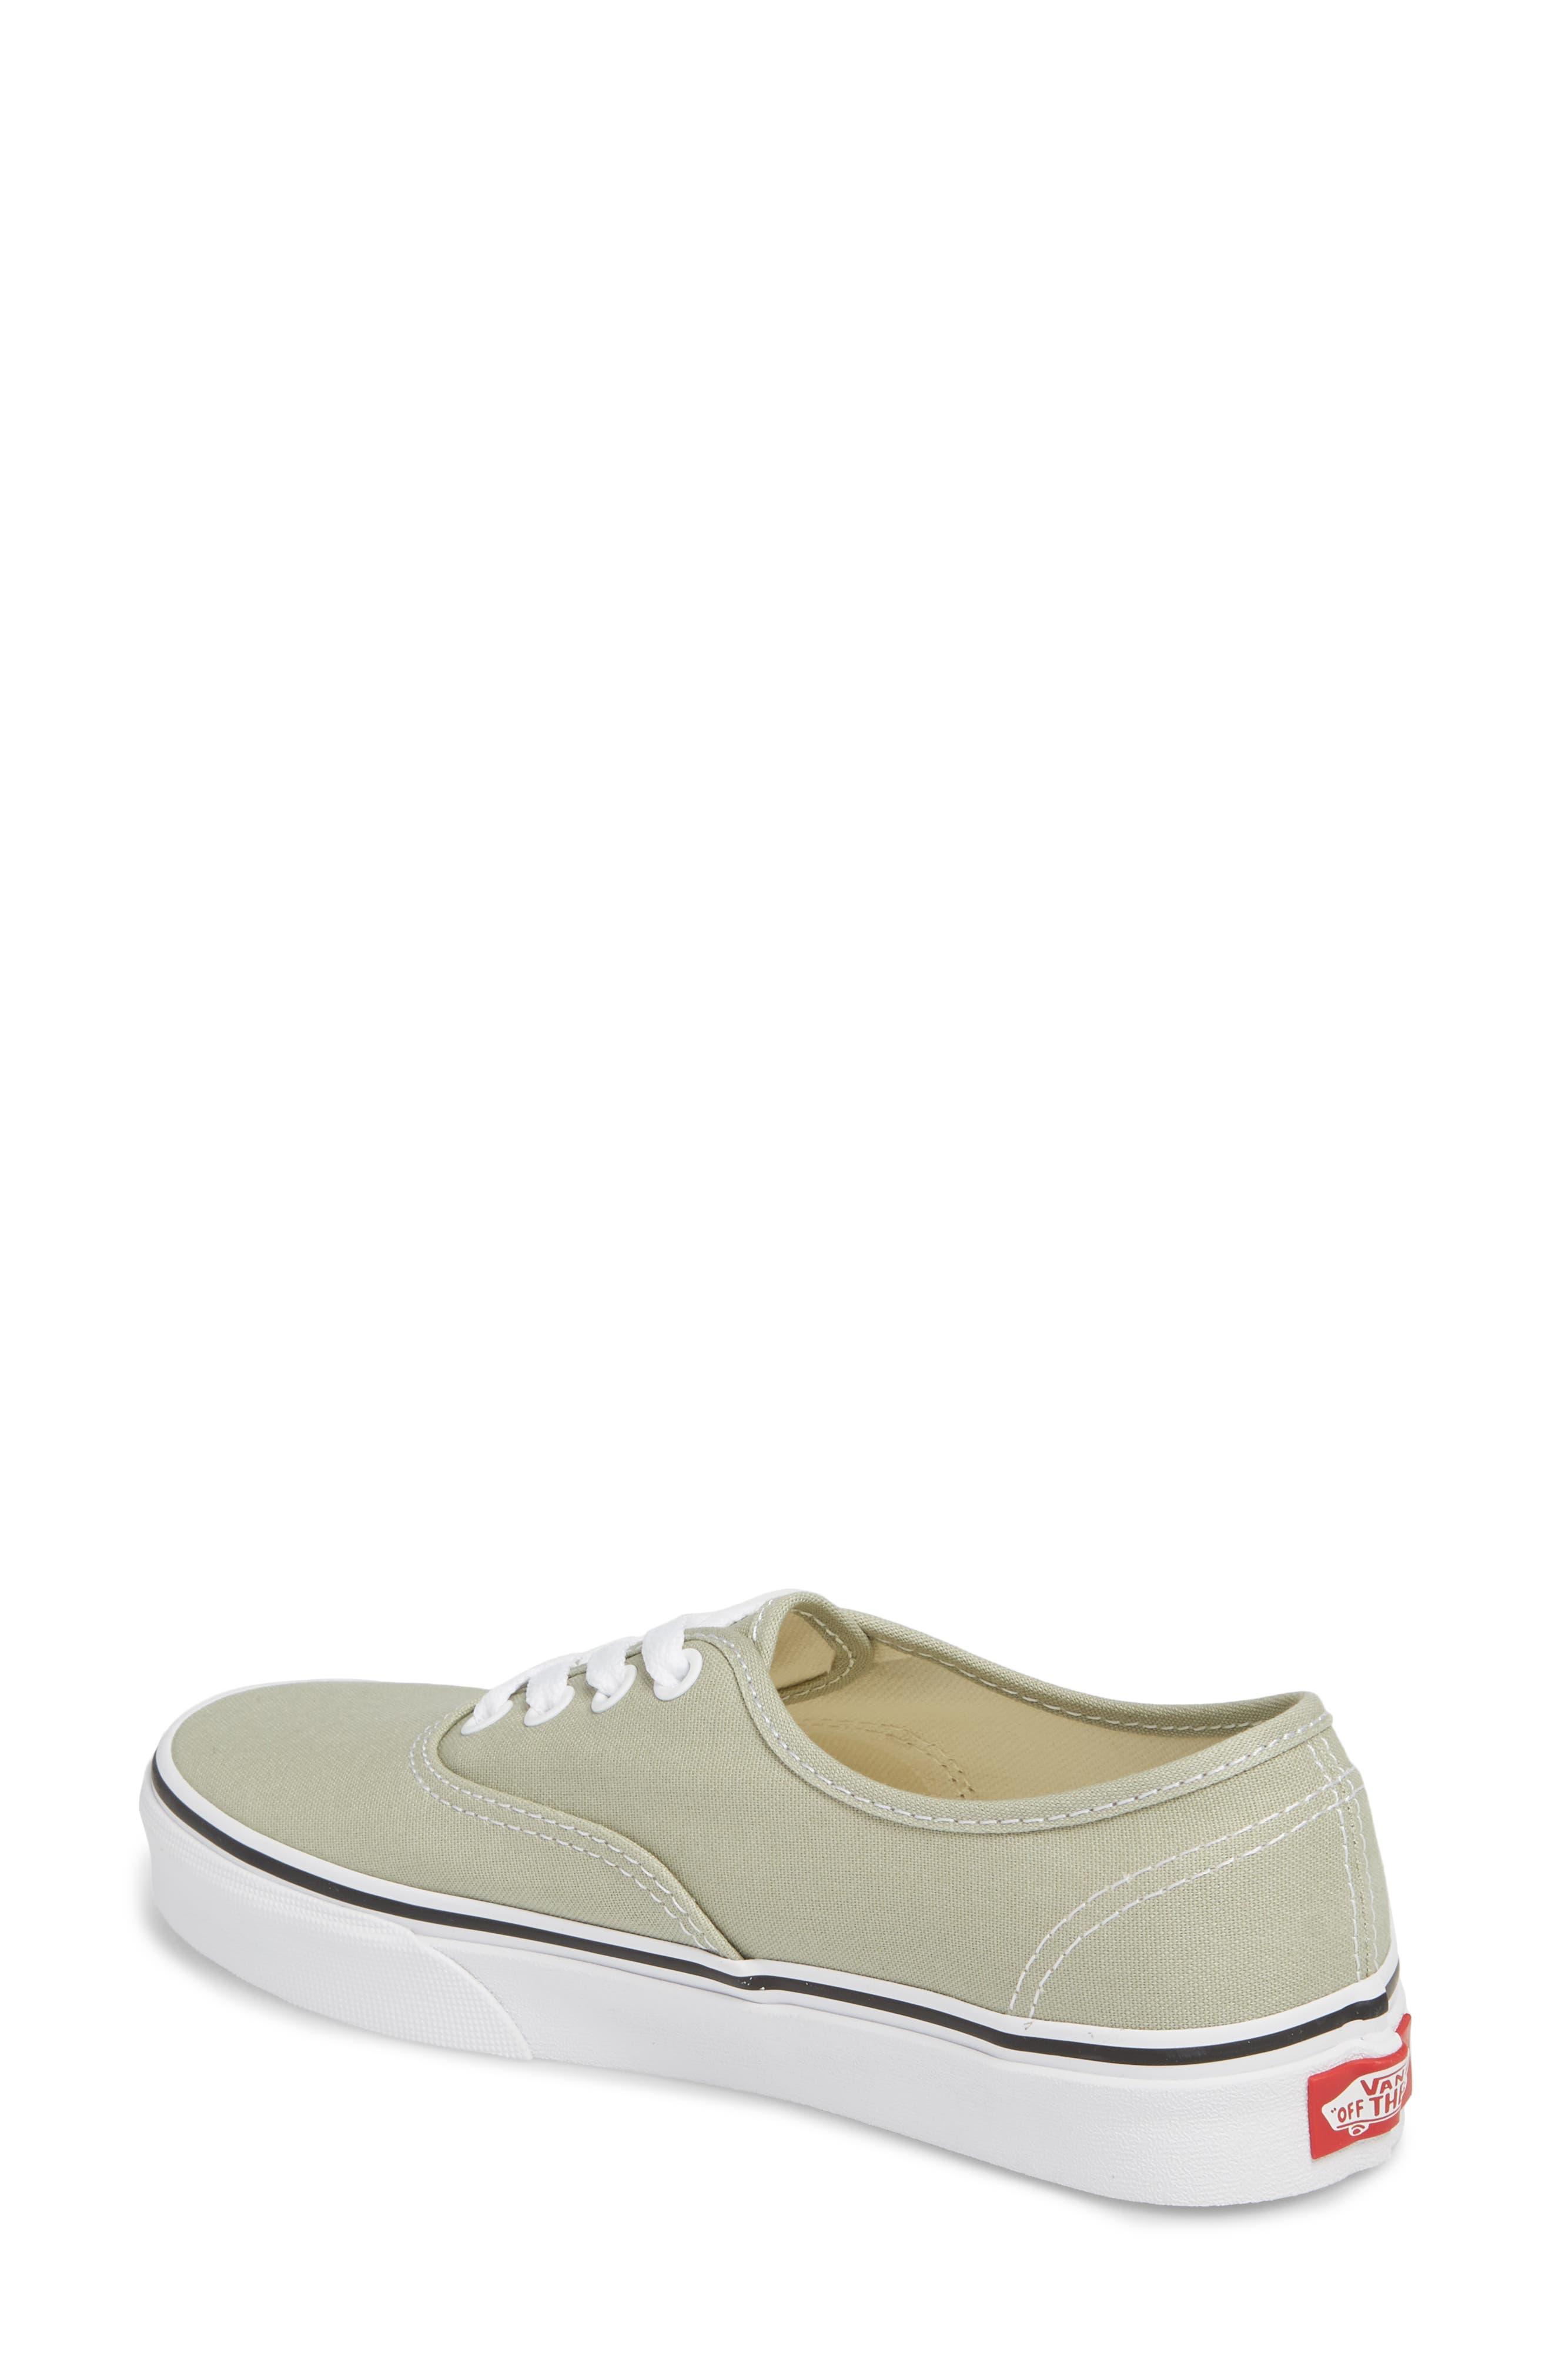 ,                             'Authentic' Sneaker,                             Alternate thumbnail 139, color,                             023